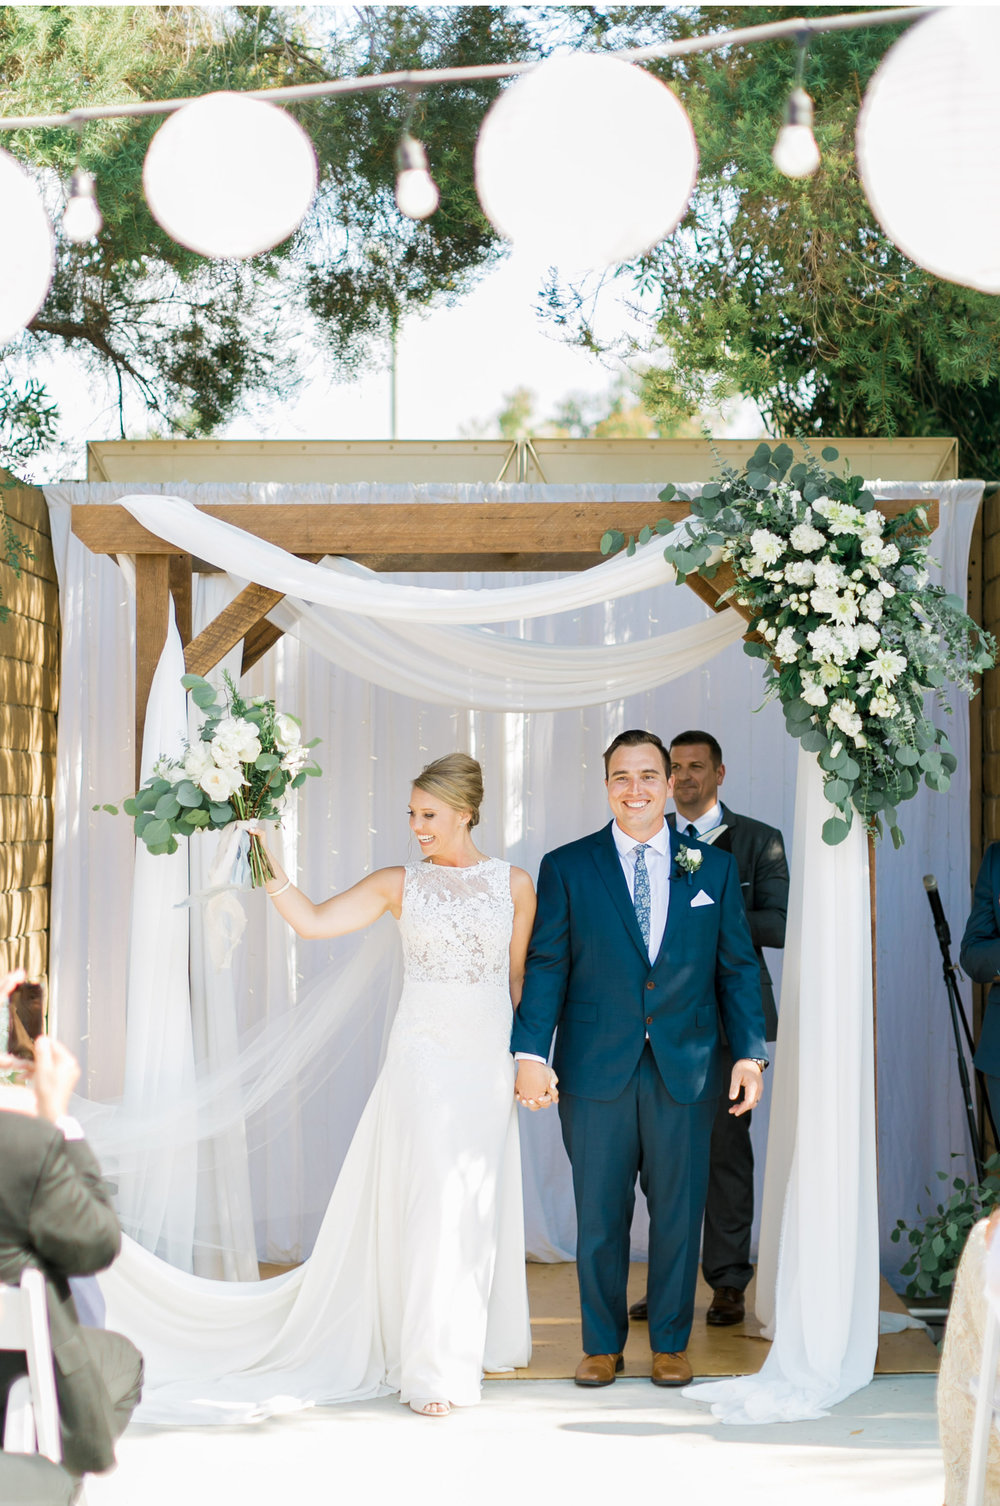 San-Luis-Obispo-Wedding-Photographer-Natalie-Schutt-Photography-Style-Me-Pretty_10.jpg